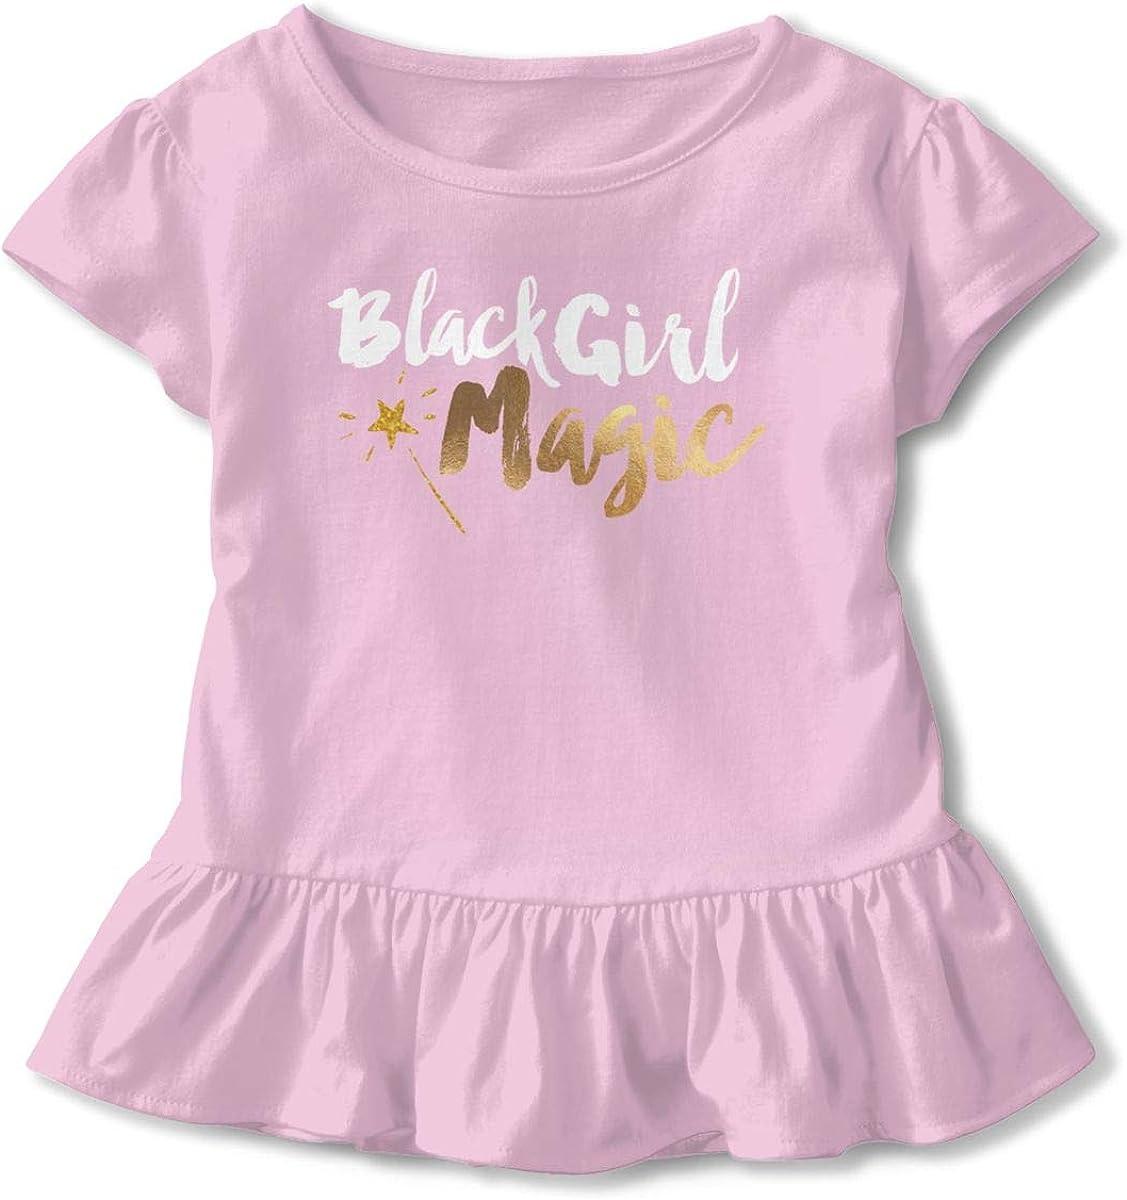 NMDJC CCQ Black Girl Magic Baby Skirts Fashion Kids T Shirt Dress Comfortable Flounces Outfits